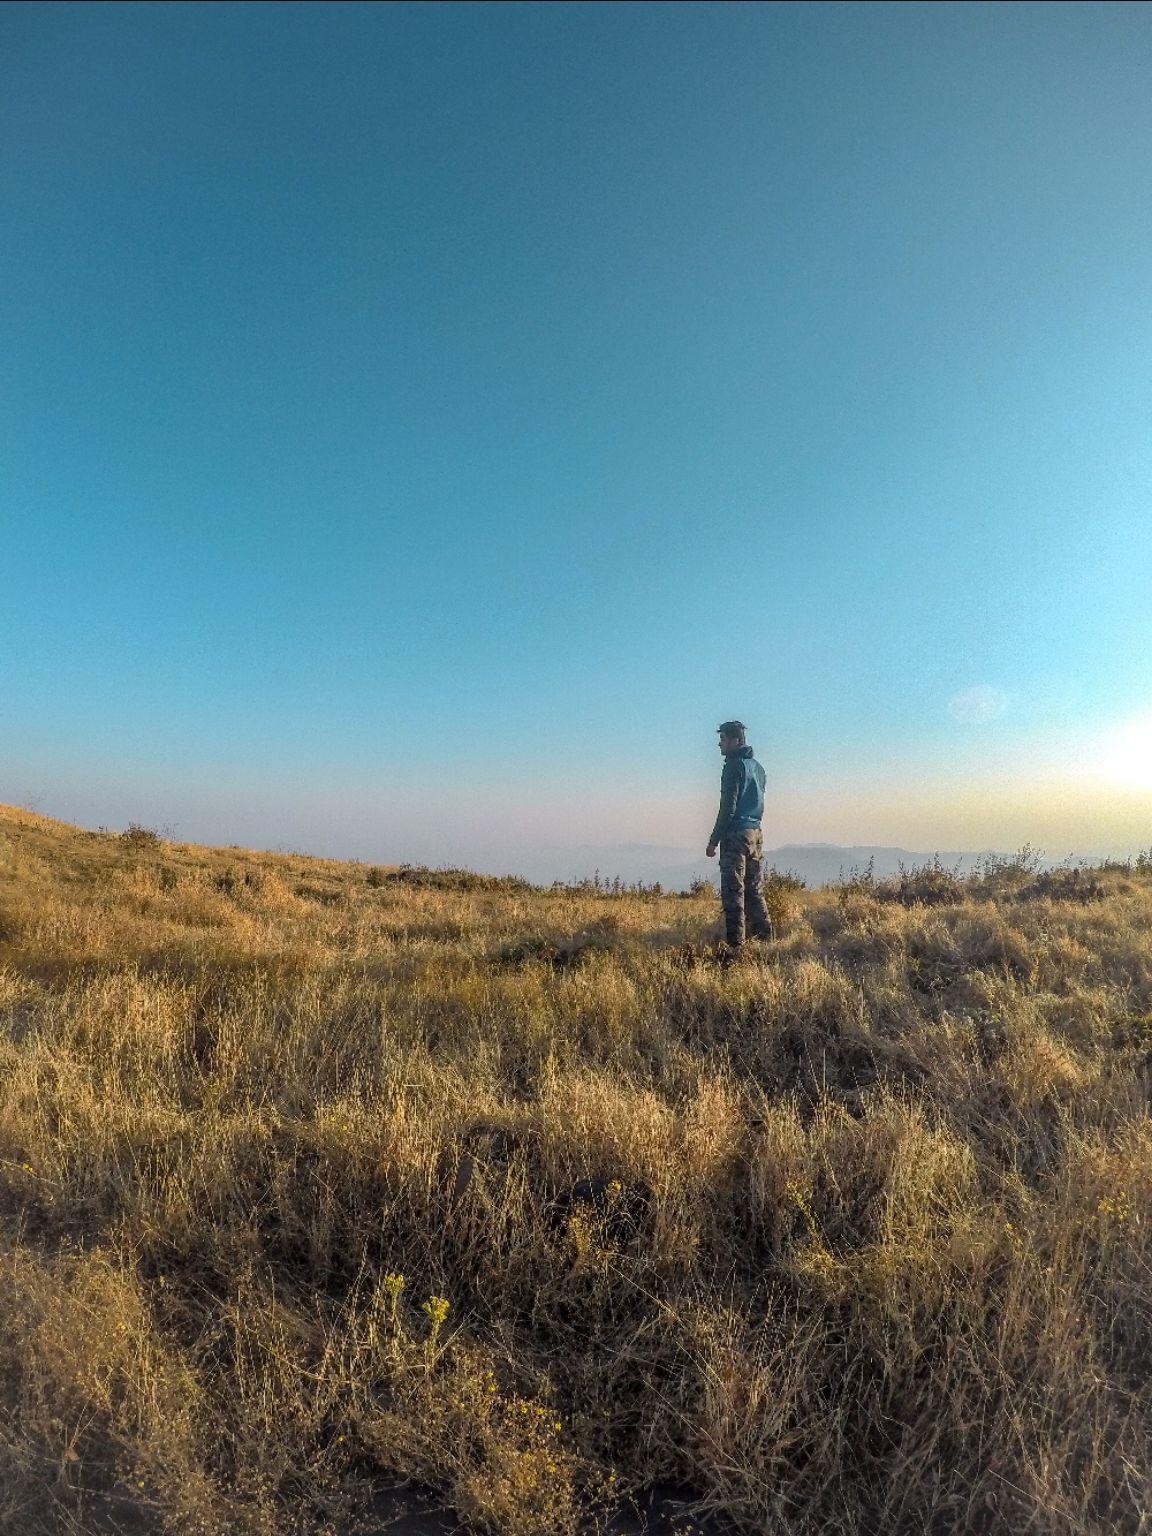 Photo of kalsubai Treking And Camping By life_through_a_helmet